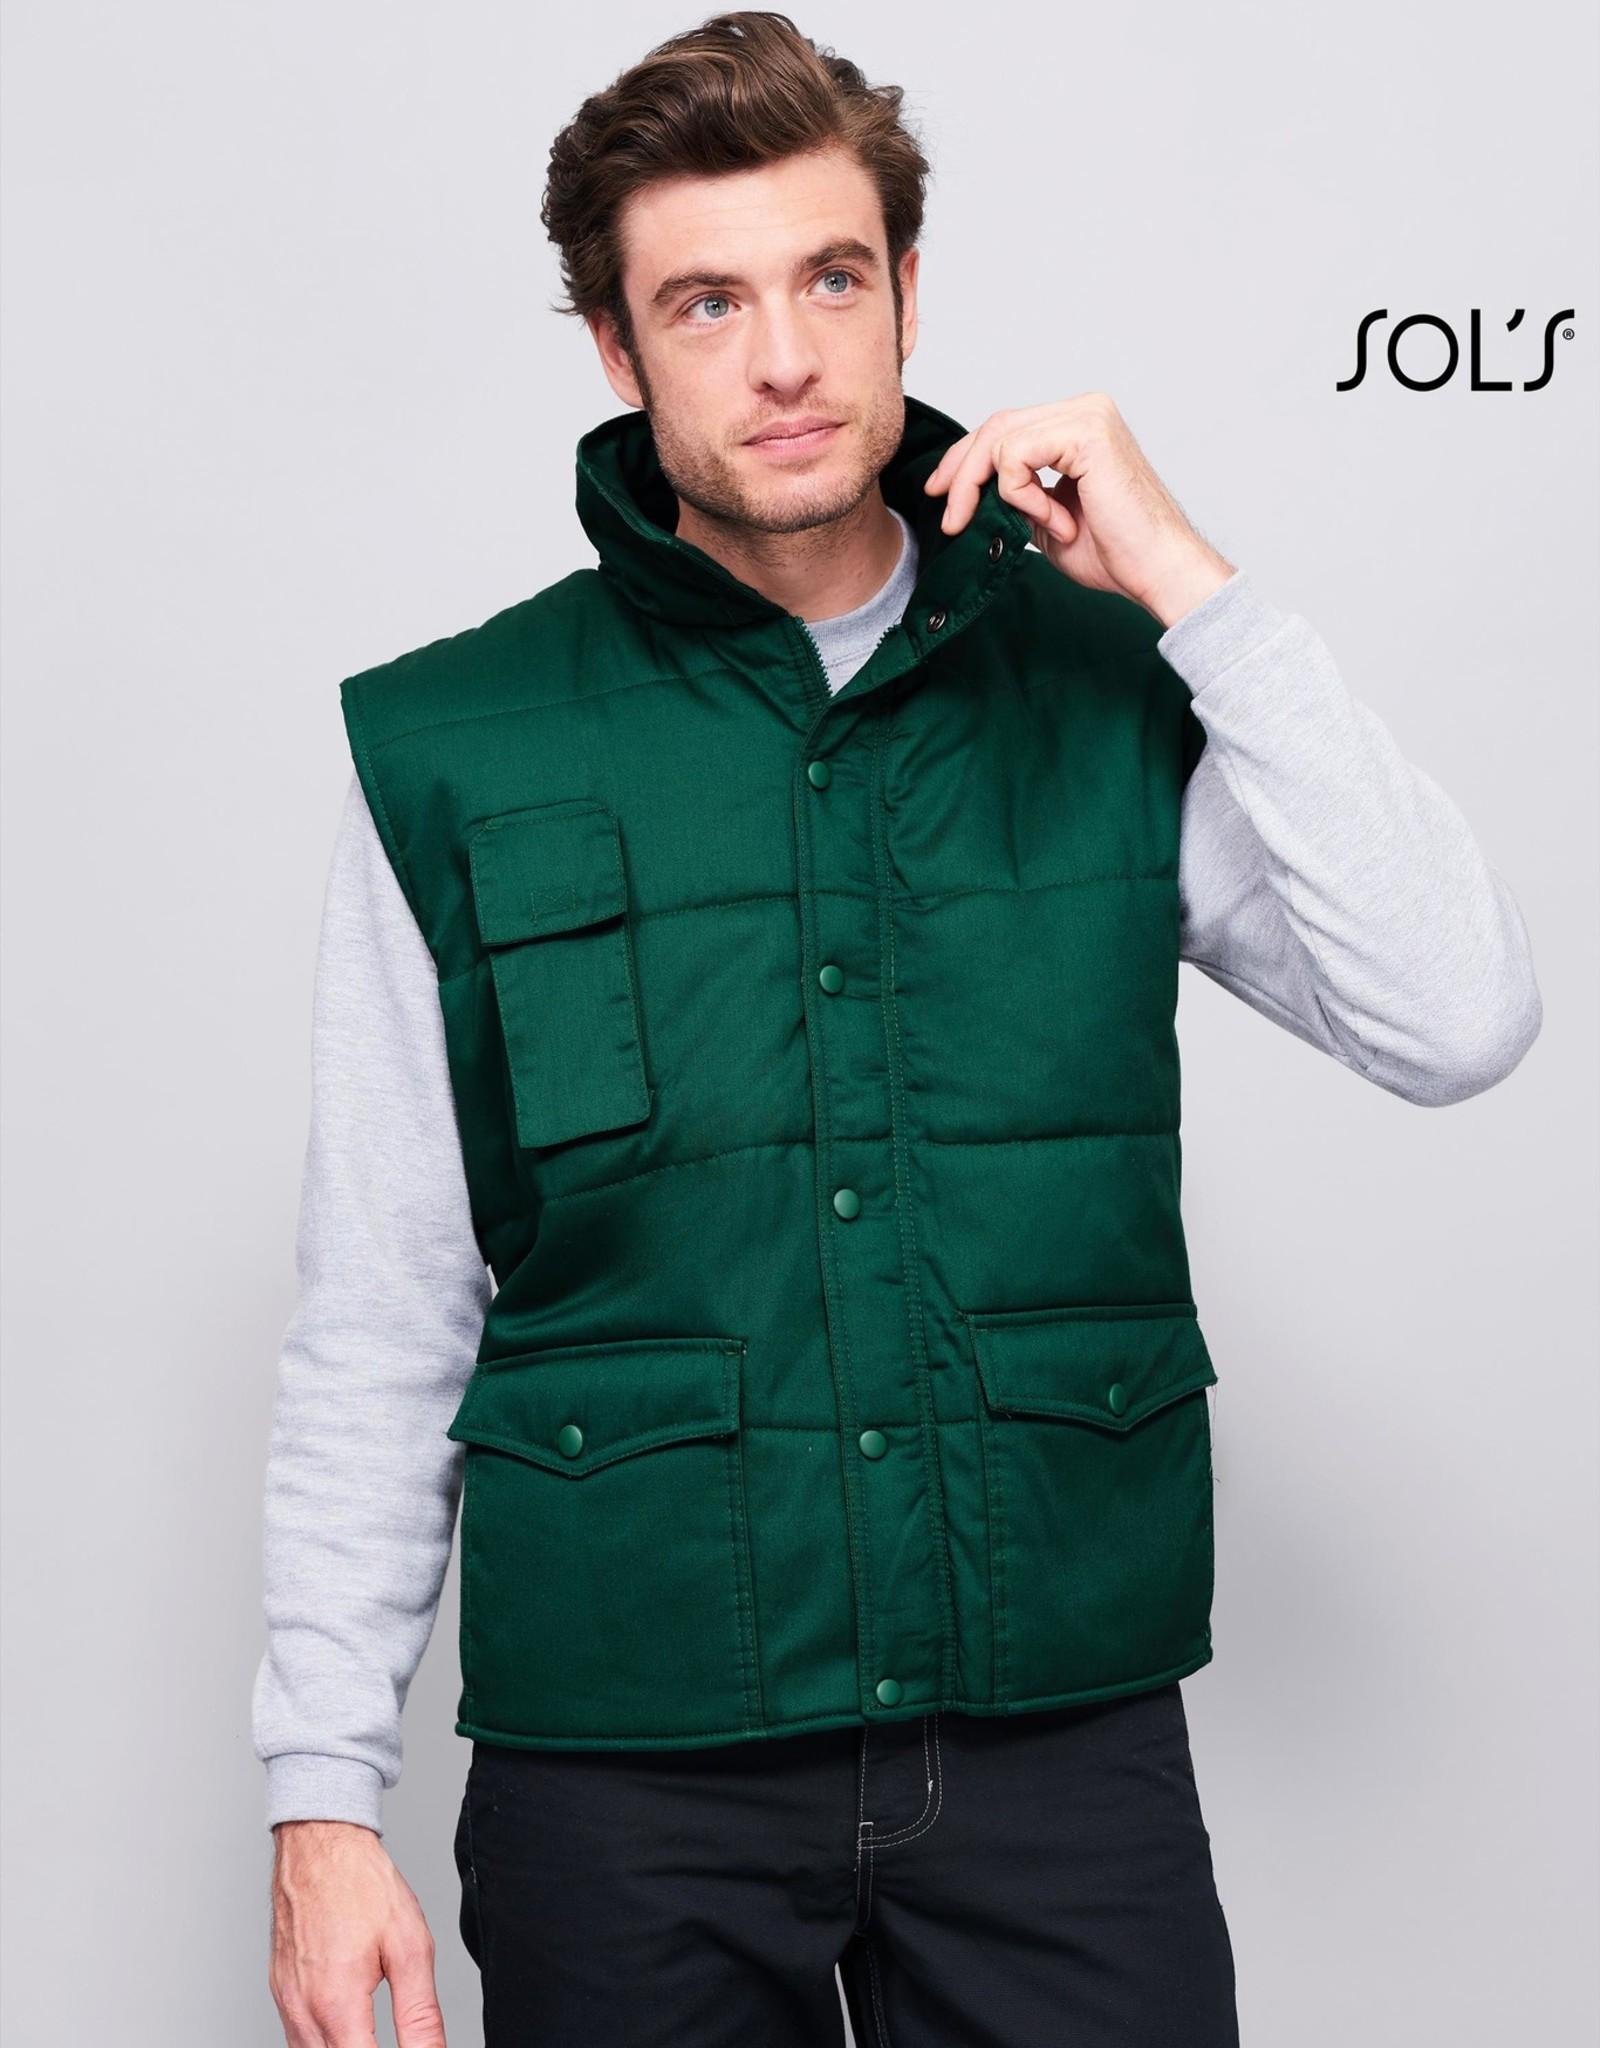 Sol's BODYWARMER 'Equinox' workwear antraciet